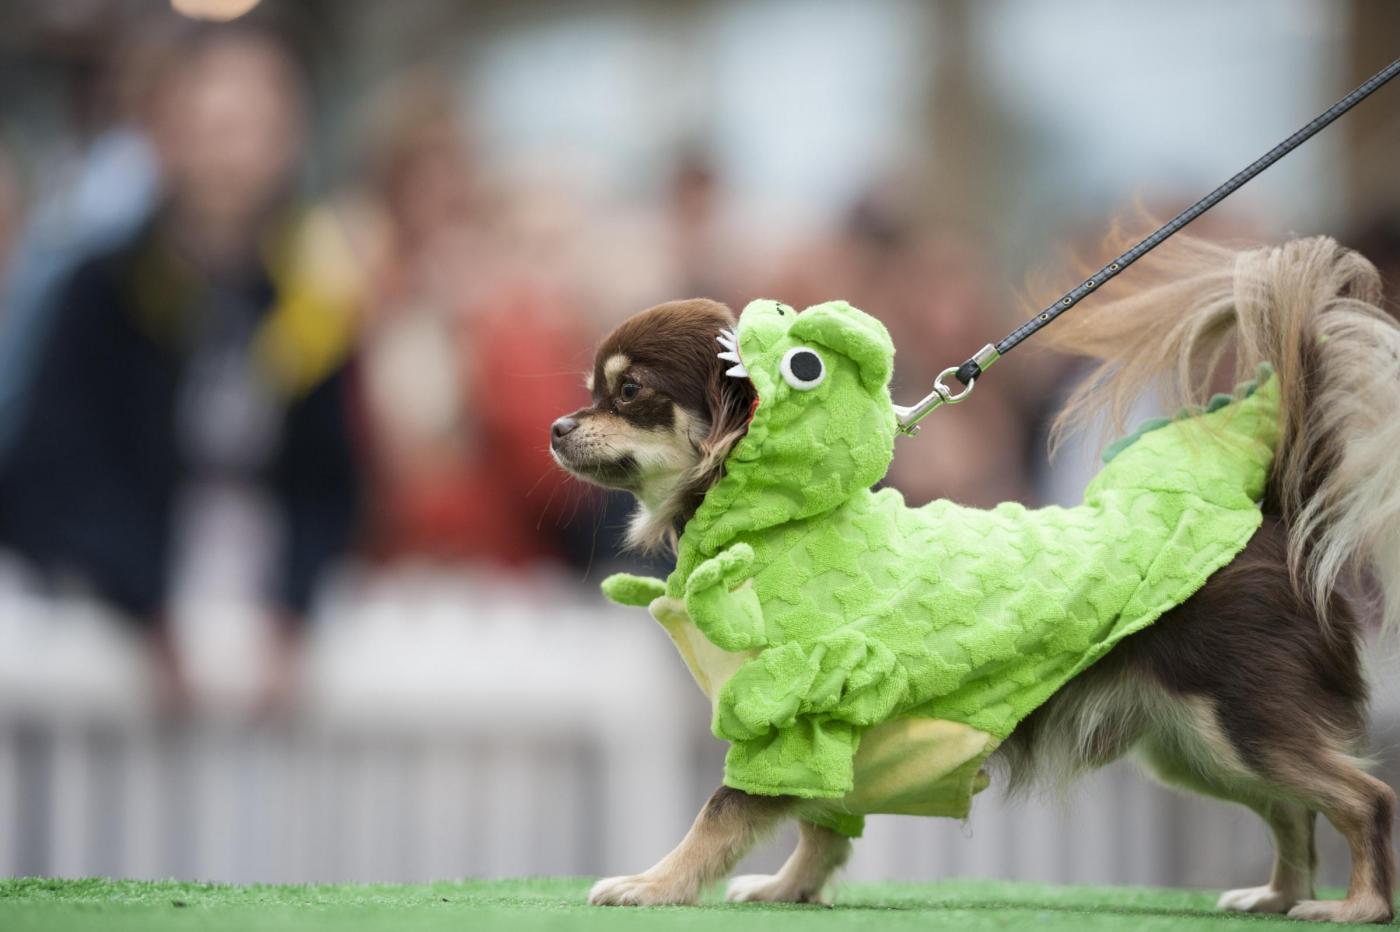 Sfilata di moda per cani a Londra per beneficenza